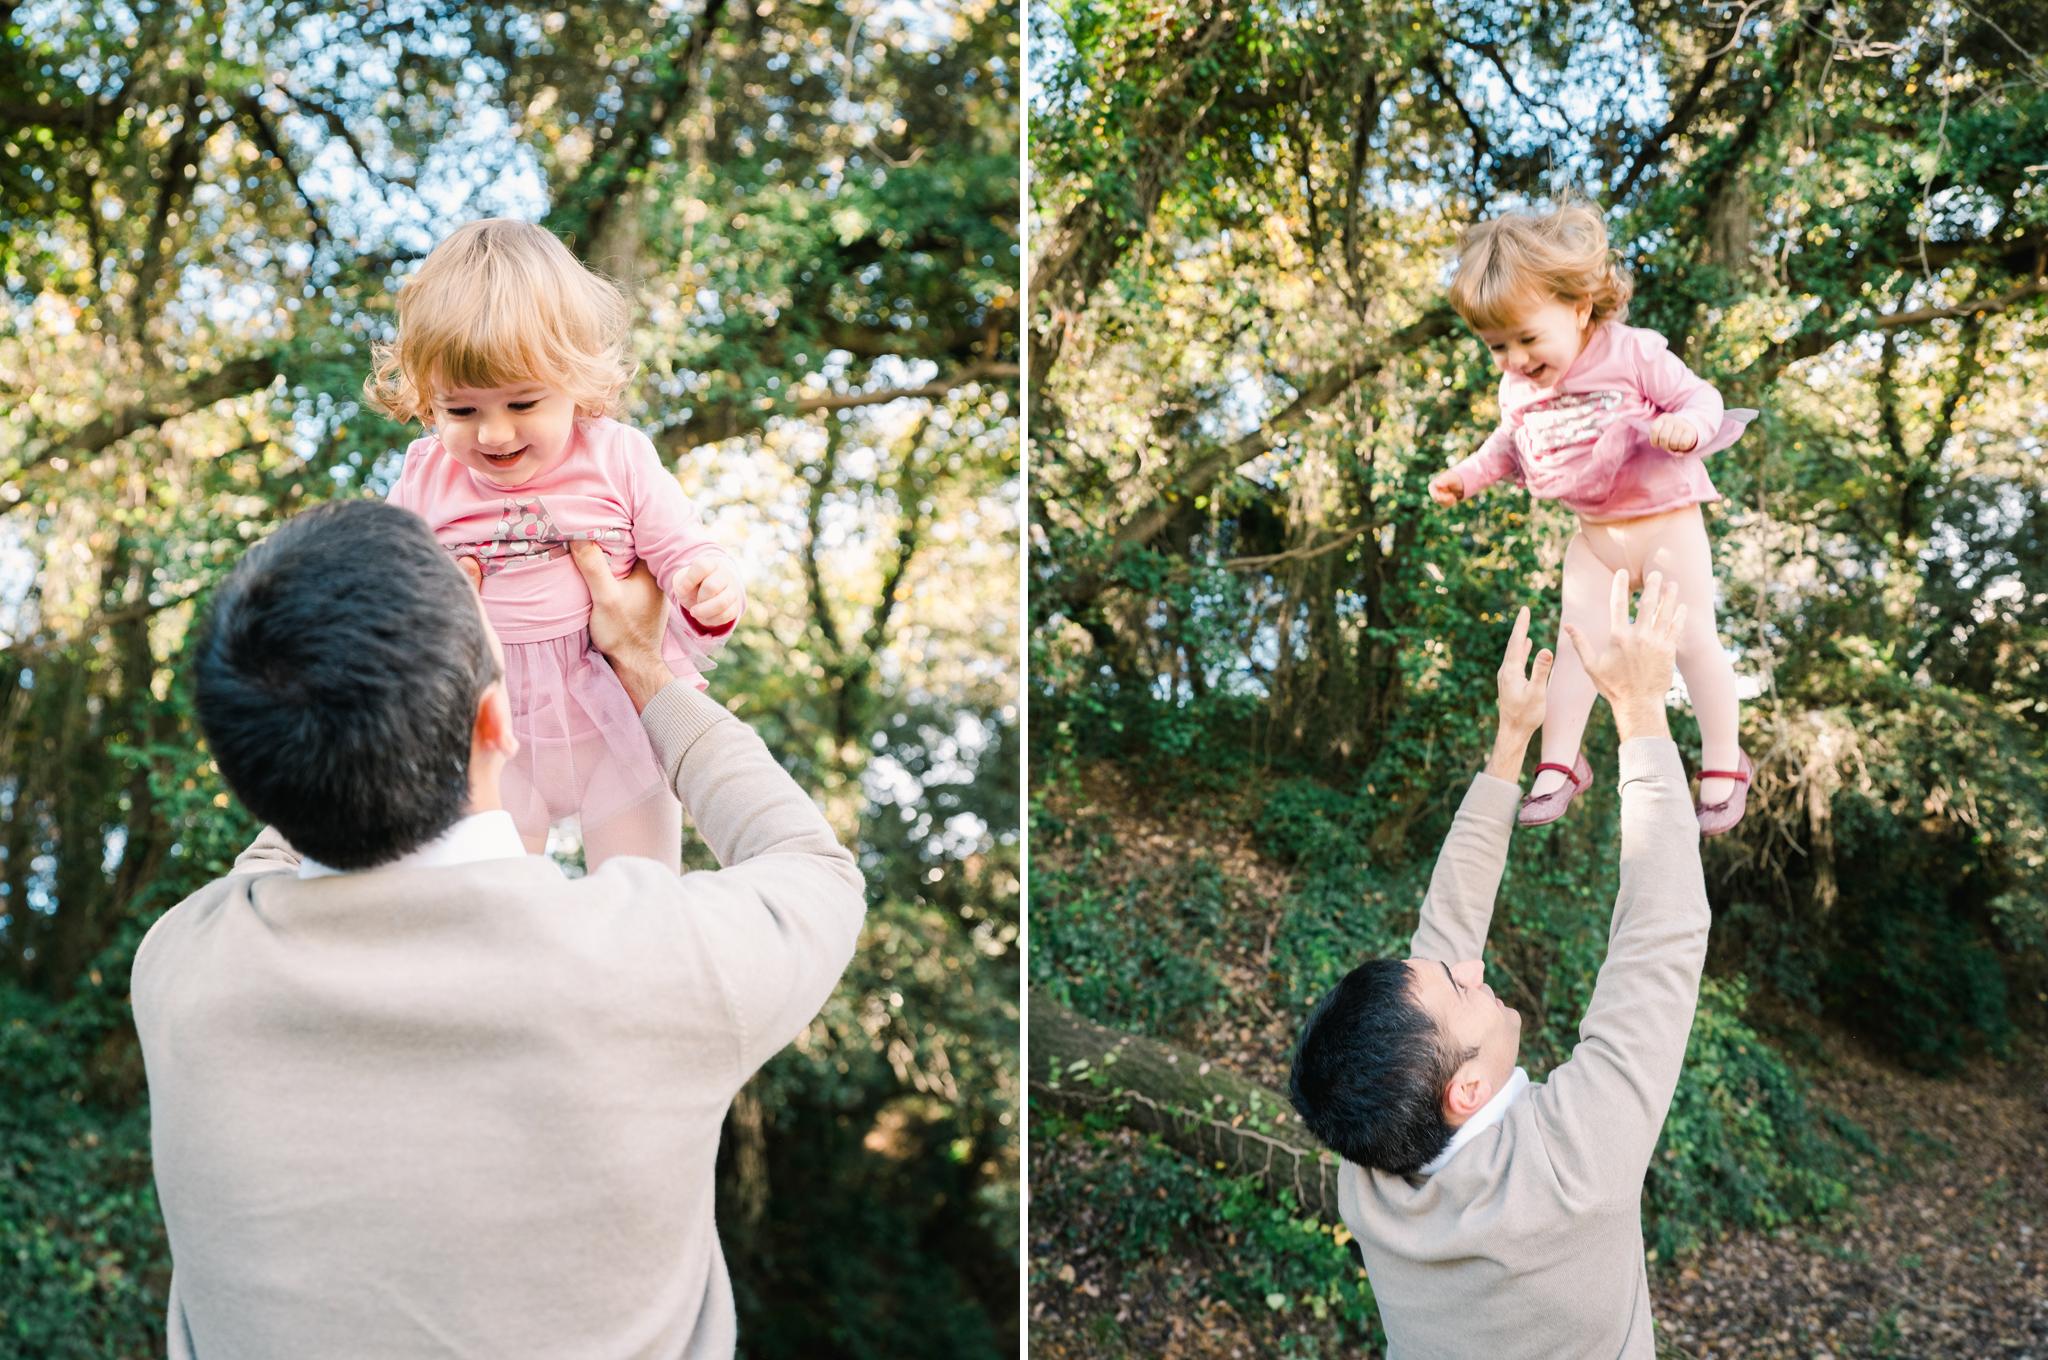 fotografia-infantil-familiar15.jpg